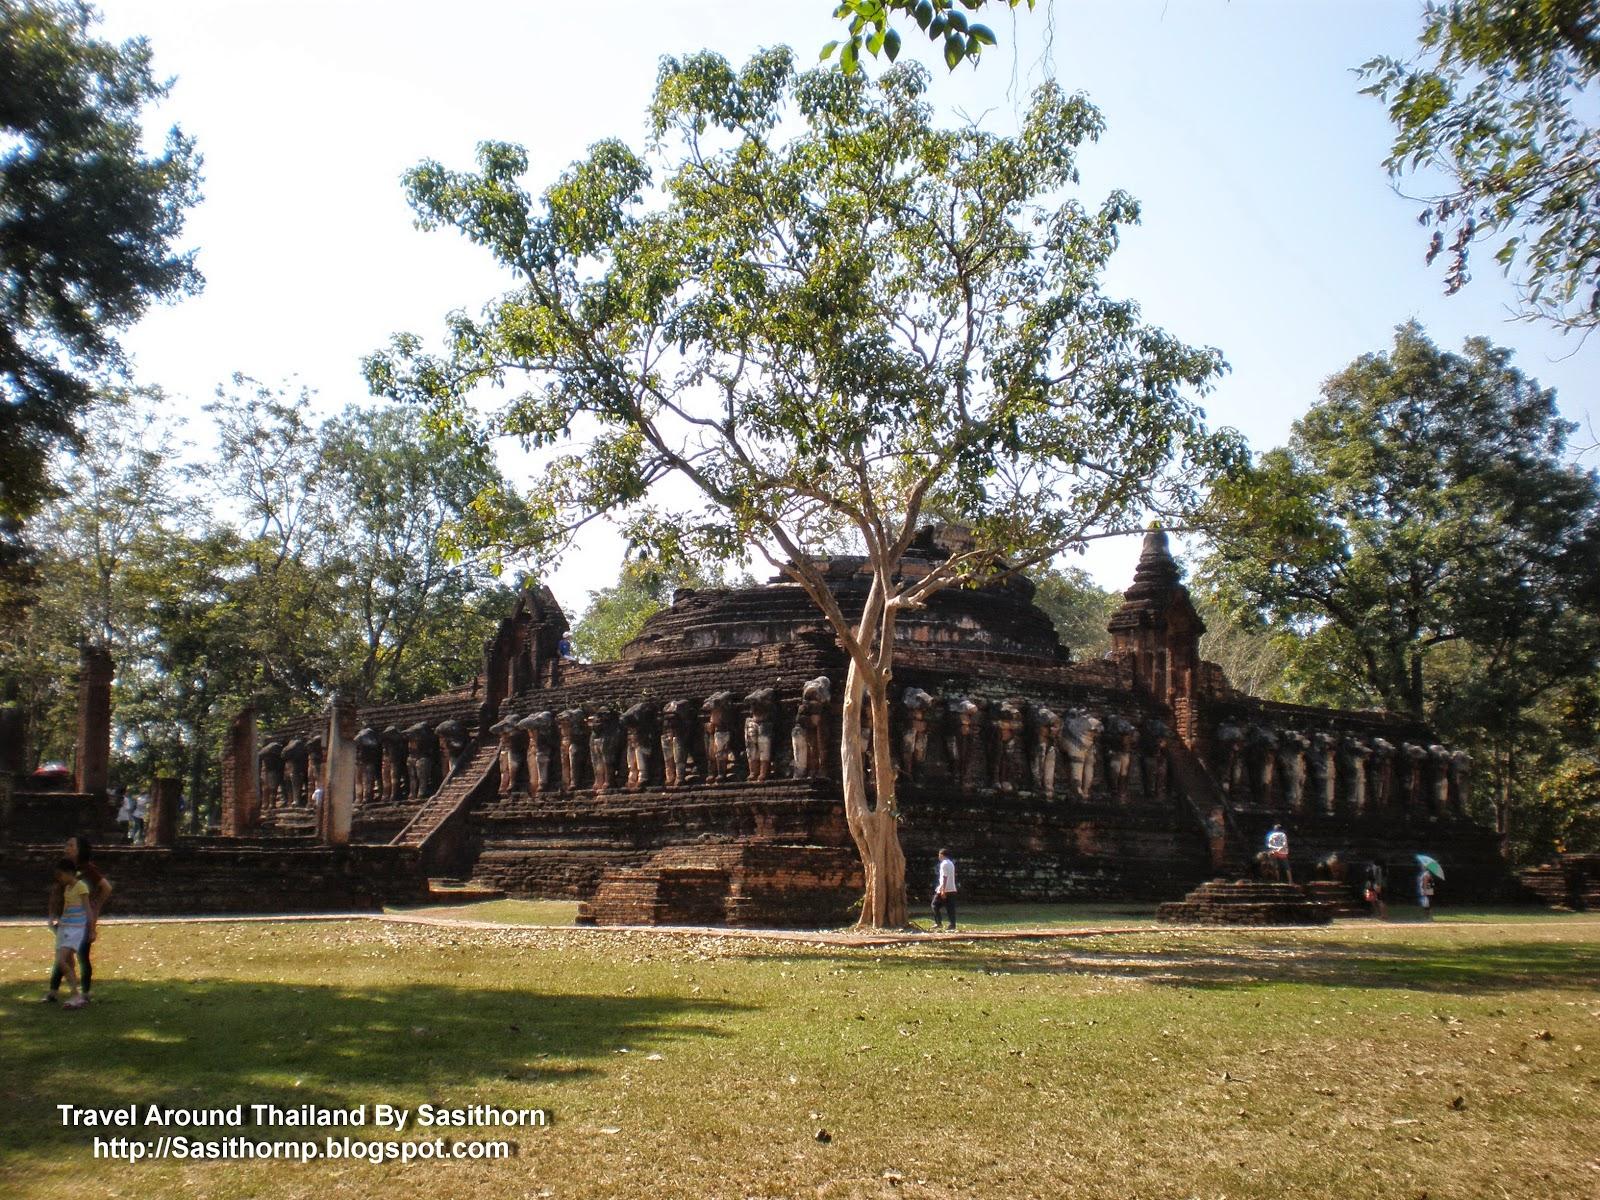 Travel Around Thailand By Sasithorn: KAMPHAENG PHET ...